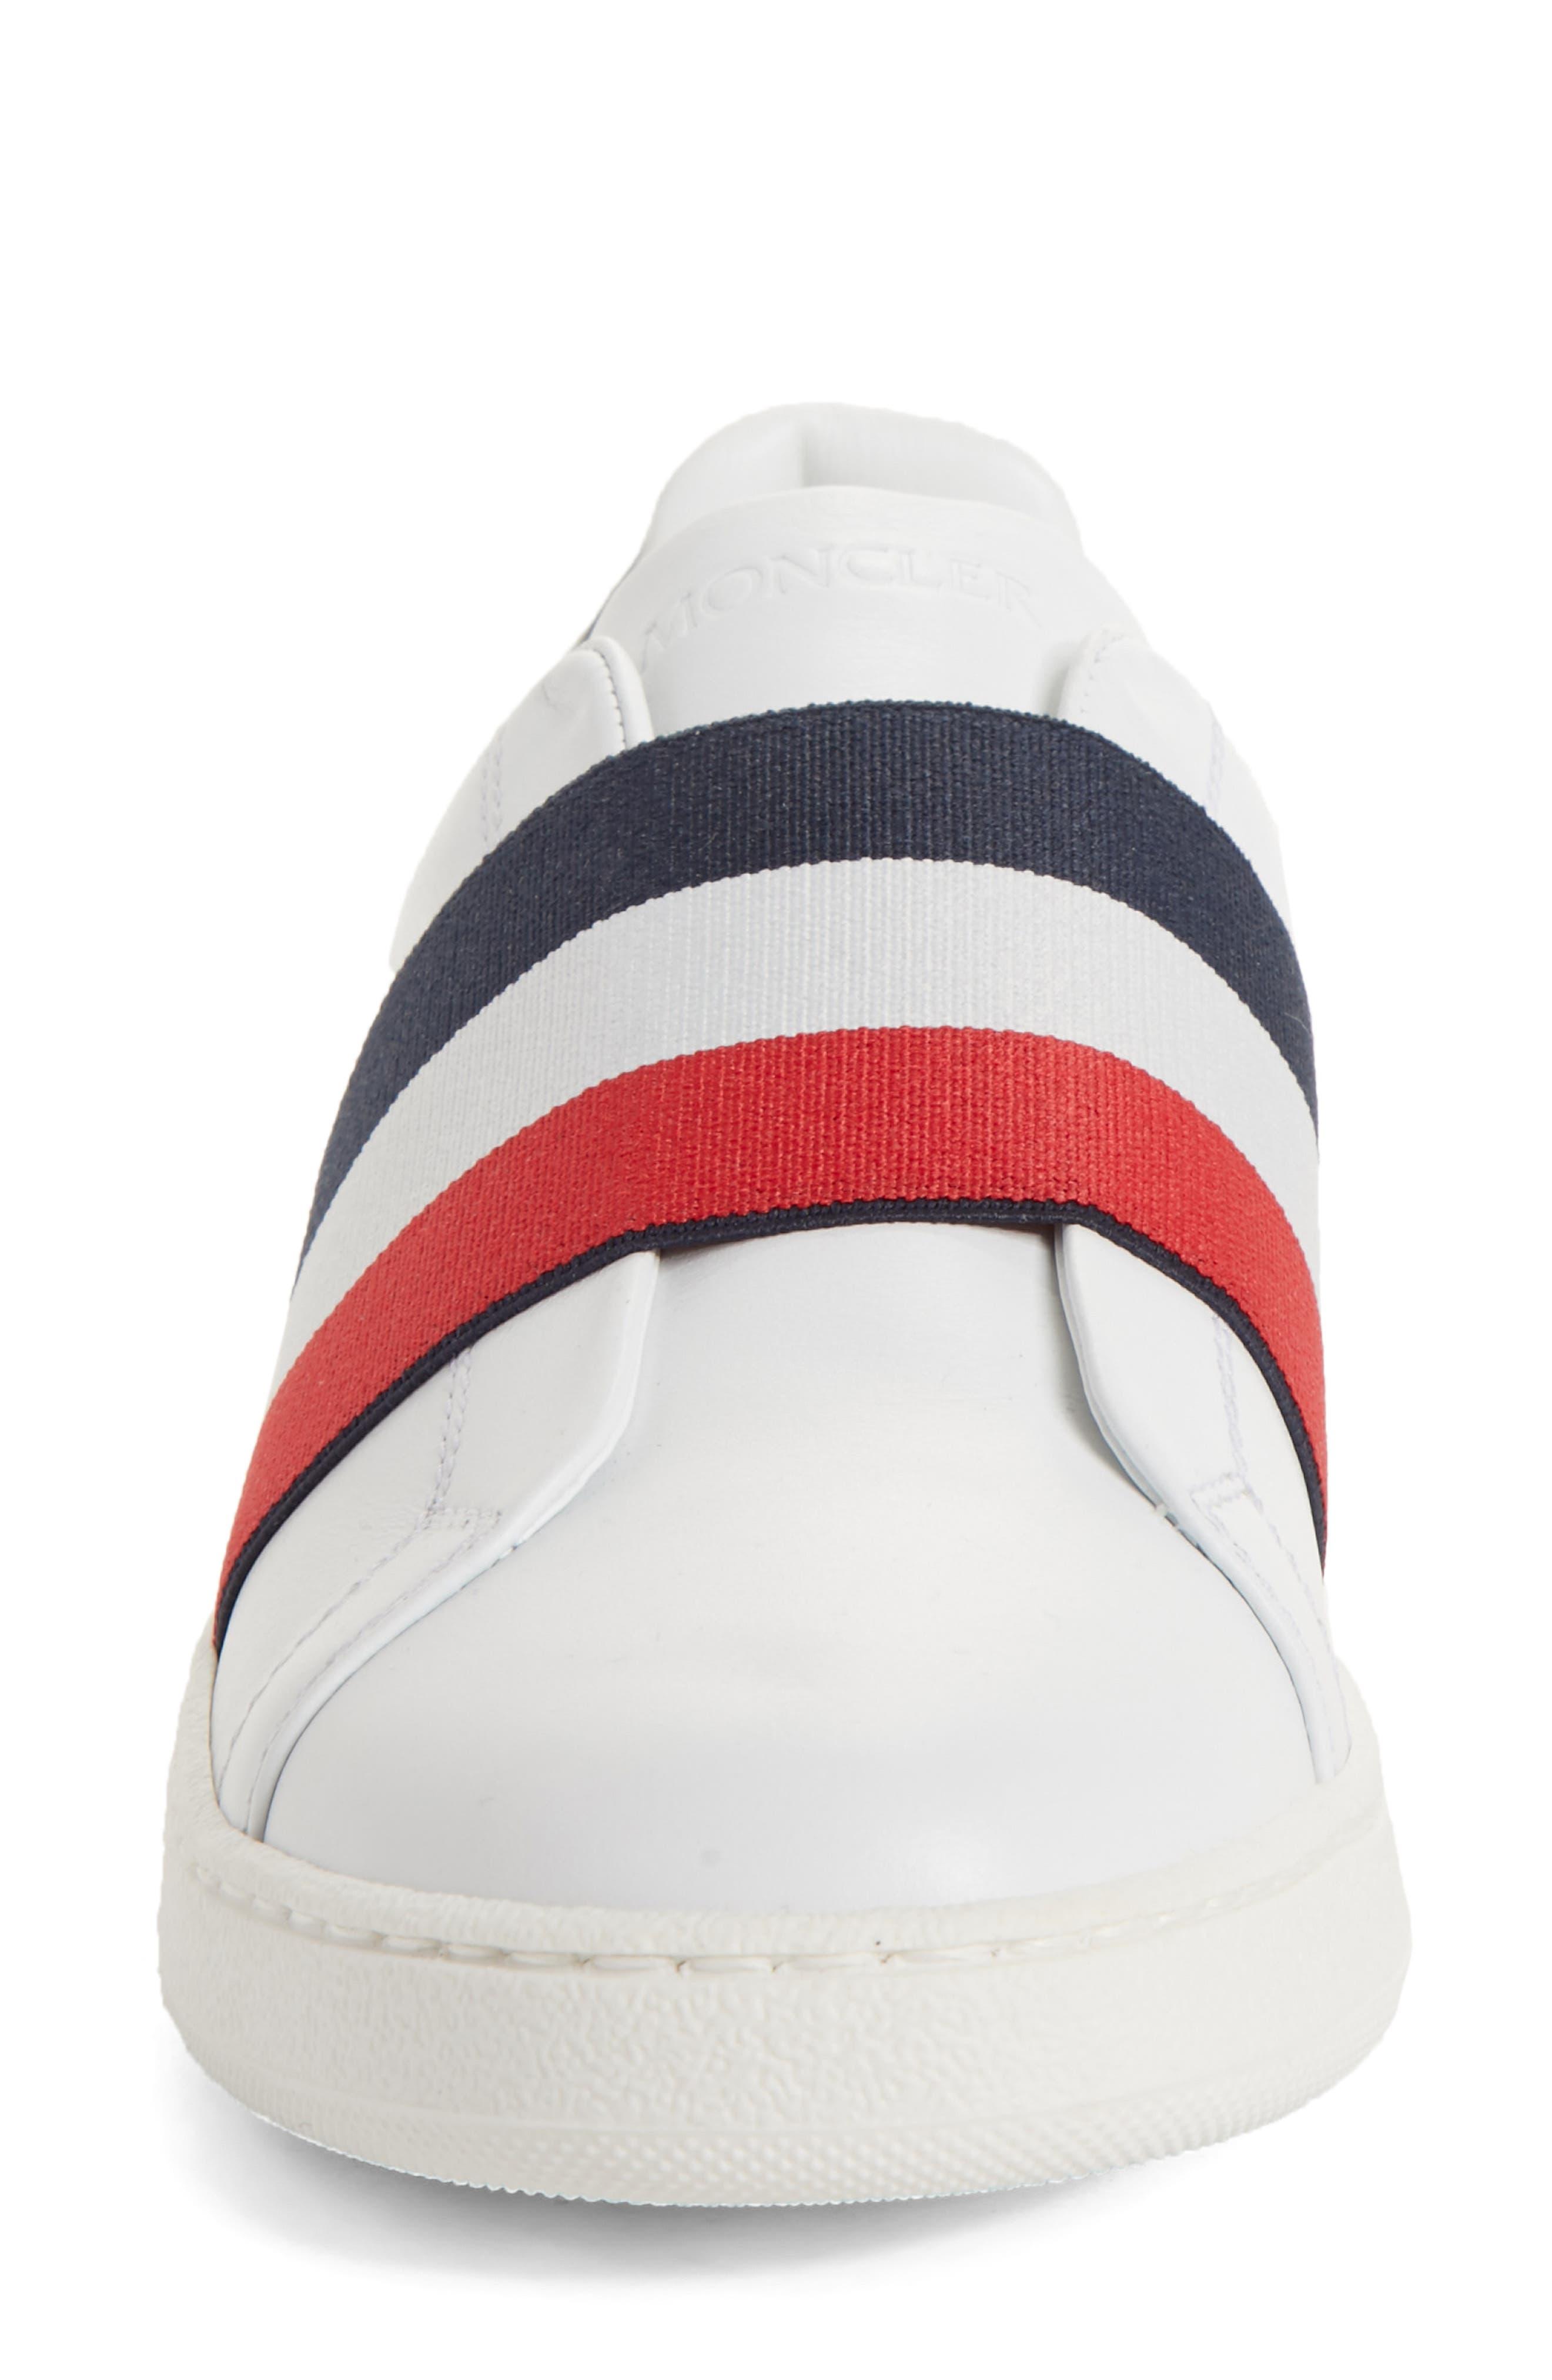 Alizee Low Top Sneaker,                             Alternate thumbnail 4, color,                             White